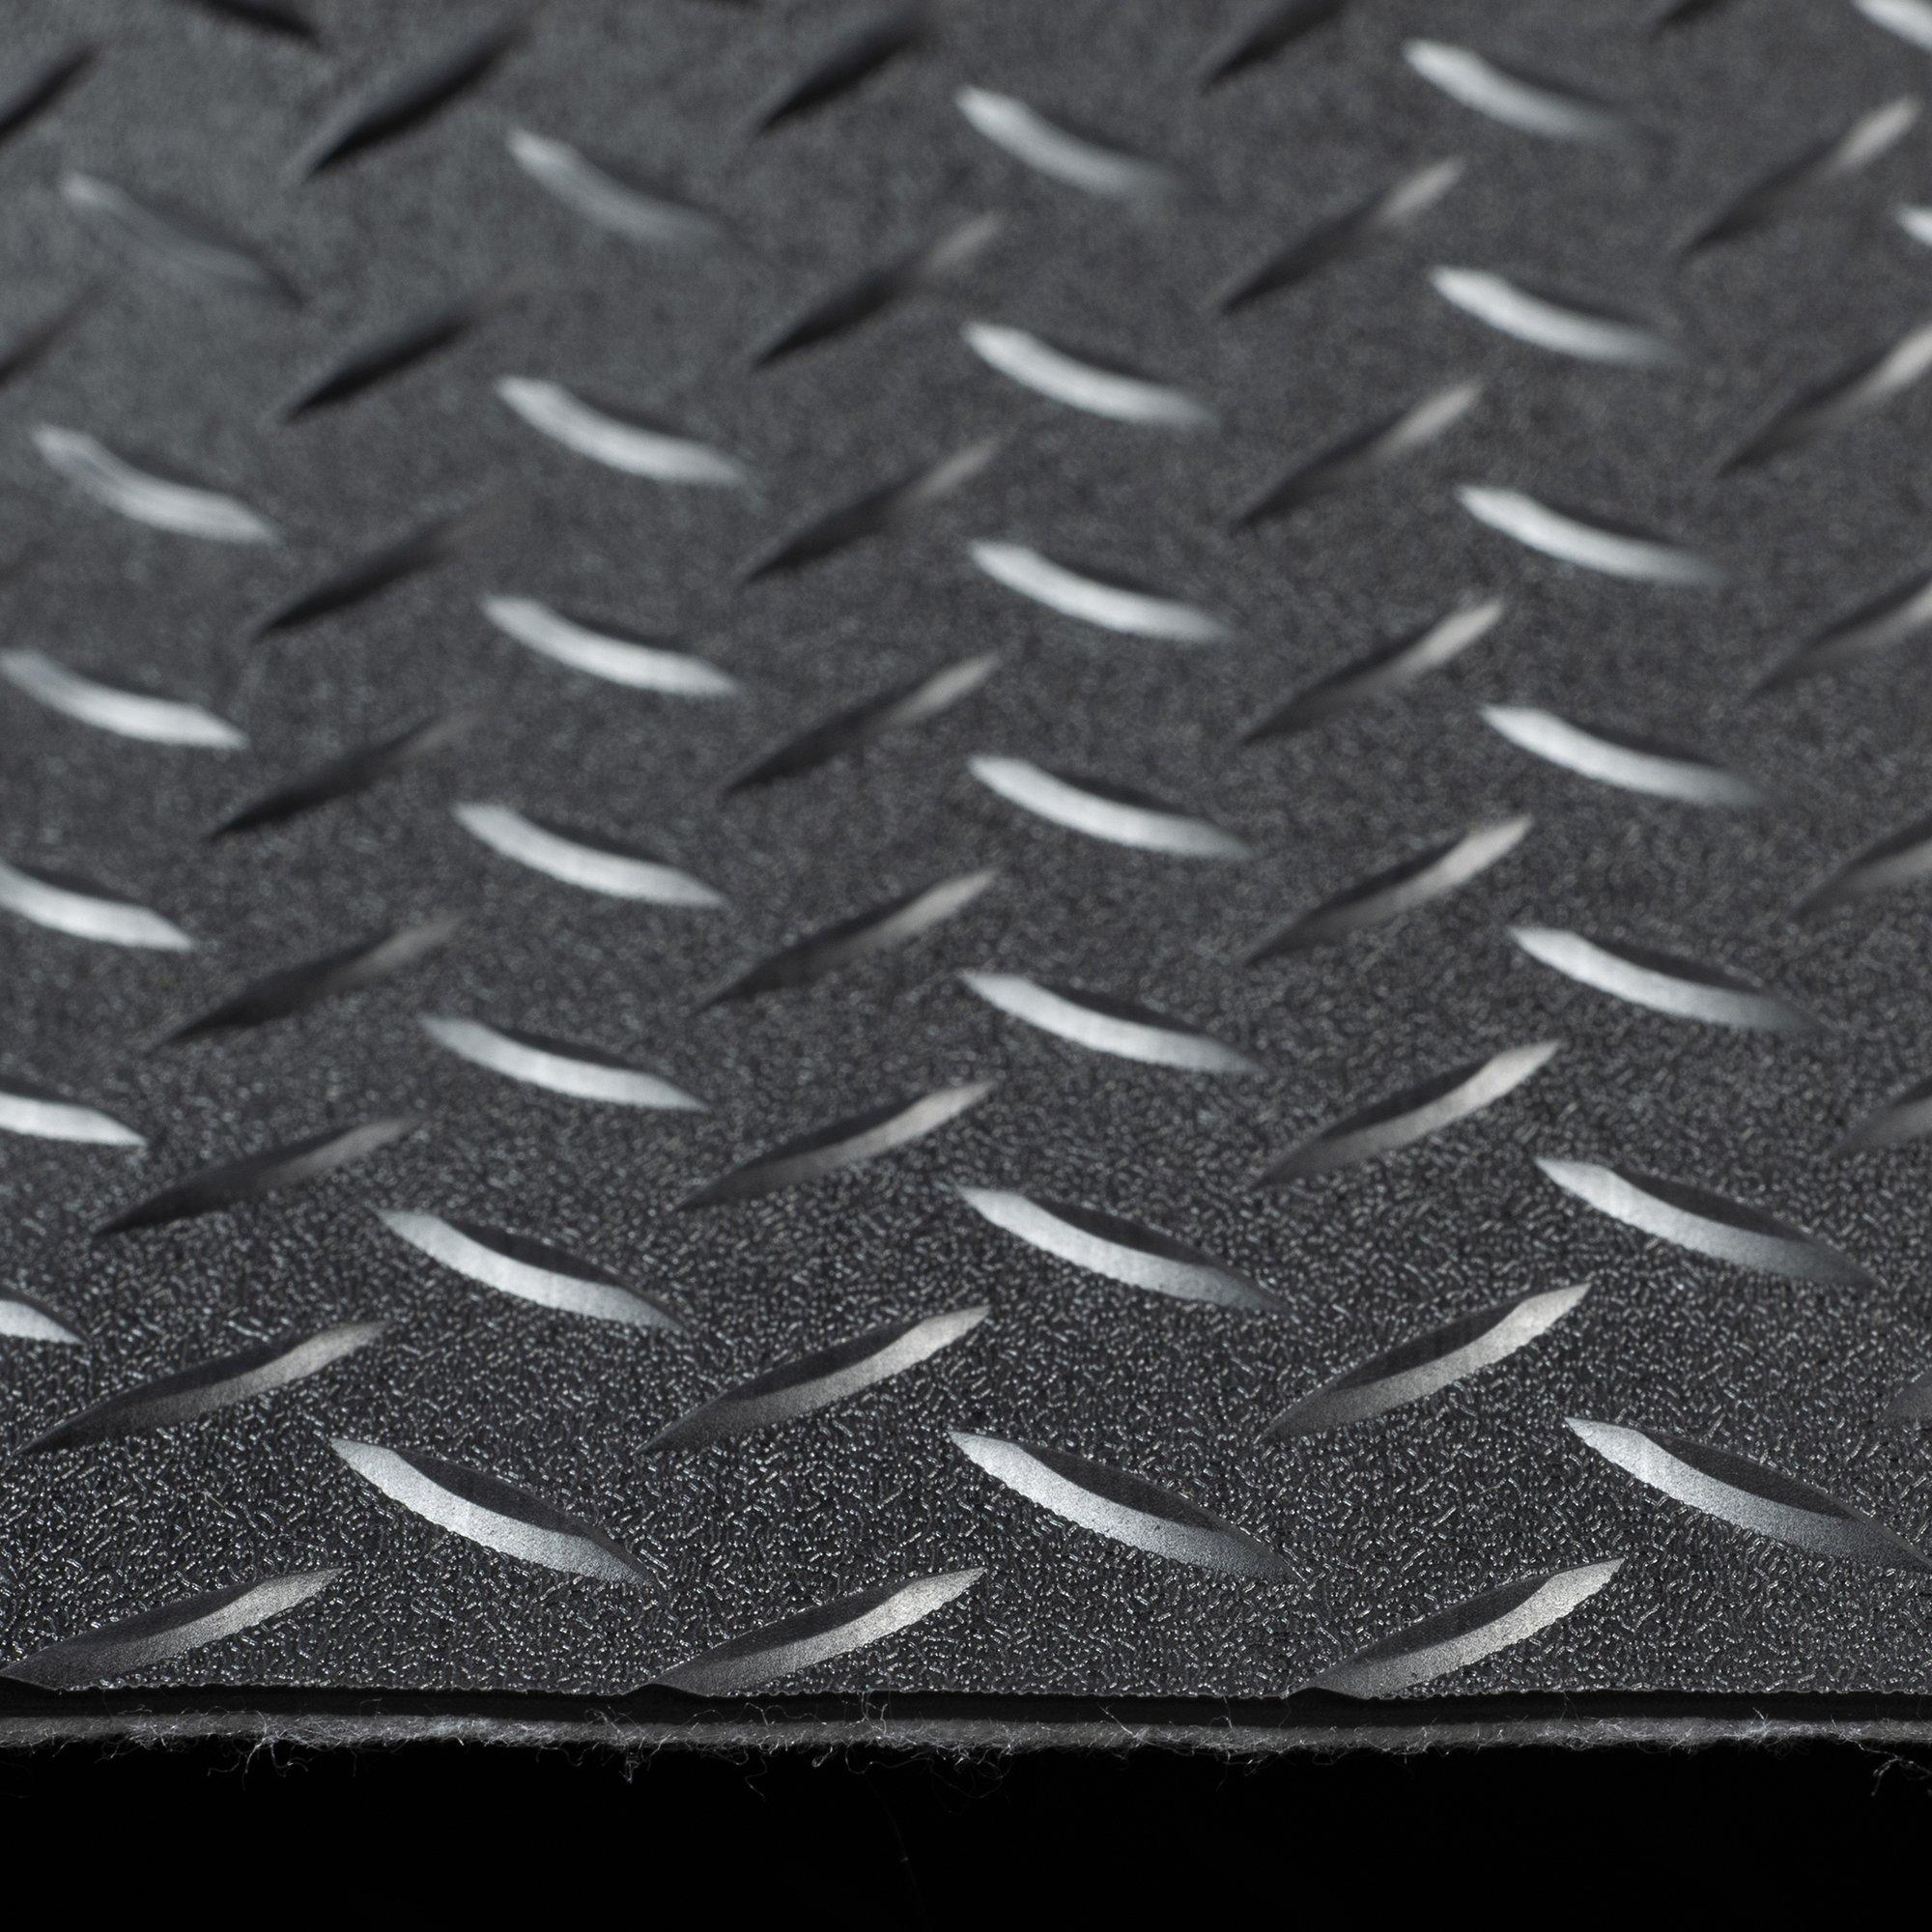 RV Trailer Diamond Plate Pattern Flooring | Black | 8' 2'' Wide | Rubber Flooring | Garage Flooring | Gym Flooring | Toy Hauler Flooring | Car Show Trailer Flooring (Black, 10') by RecPro (Image #1)